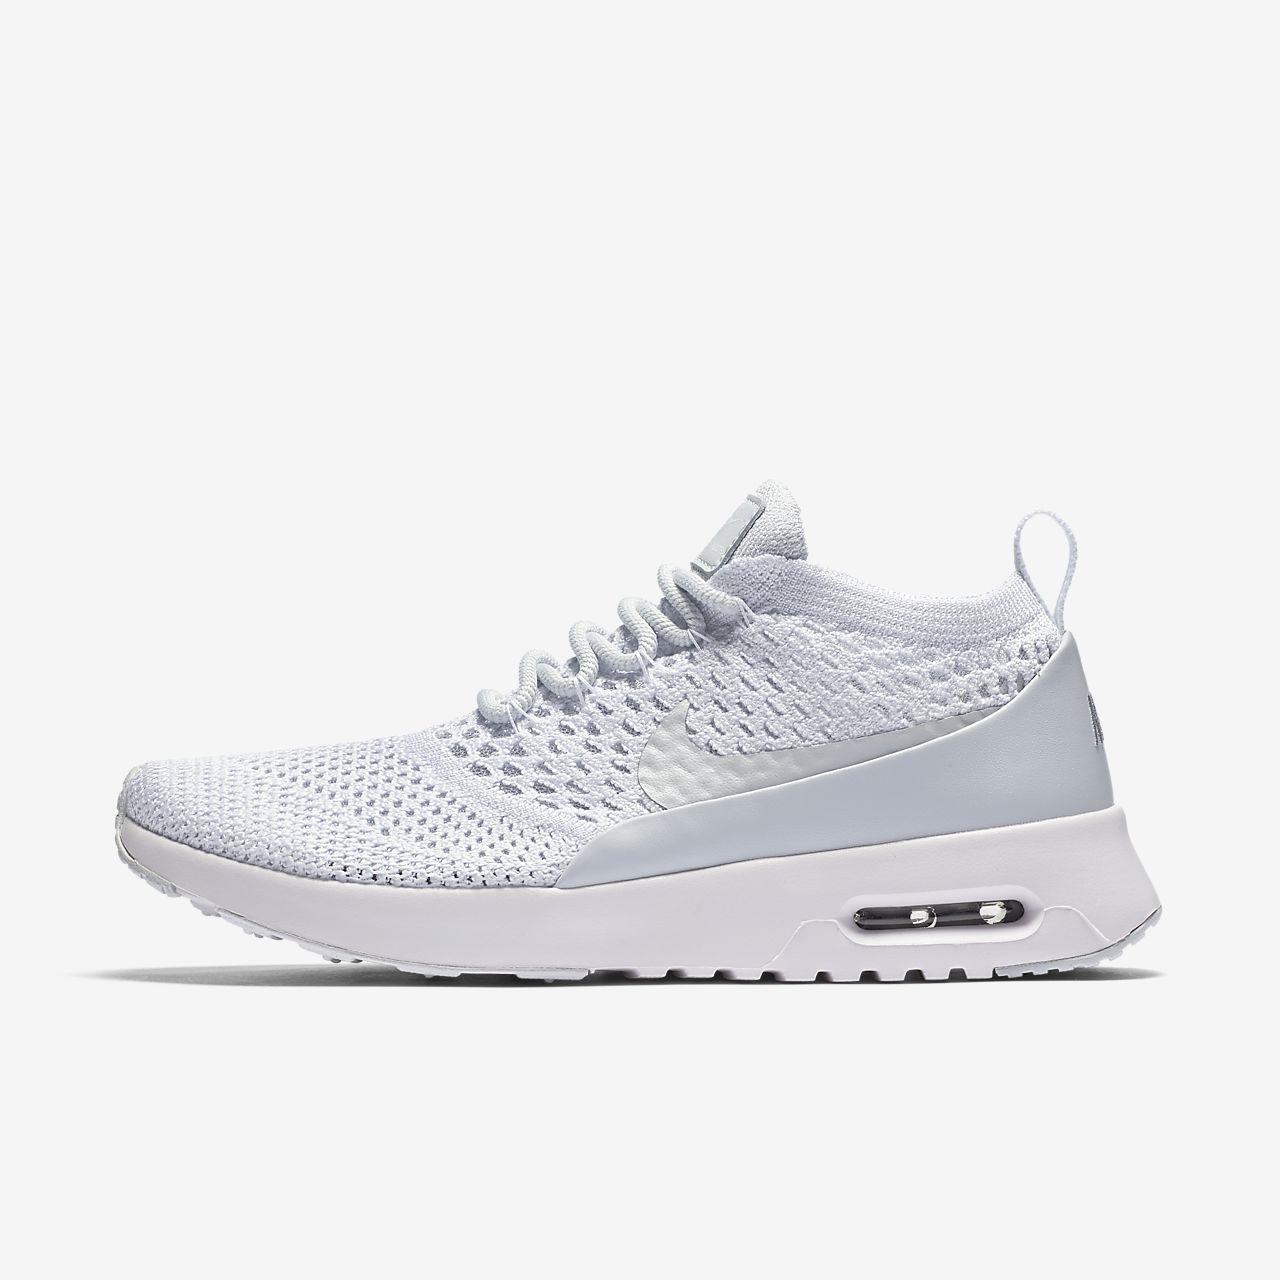 NIKE AIR MAX THEA ULTRA FK 881175 002 Running Retr Sneaker Scarpe Grey 40.5